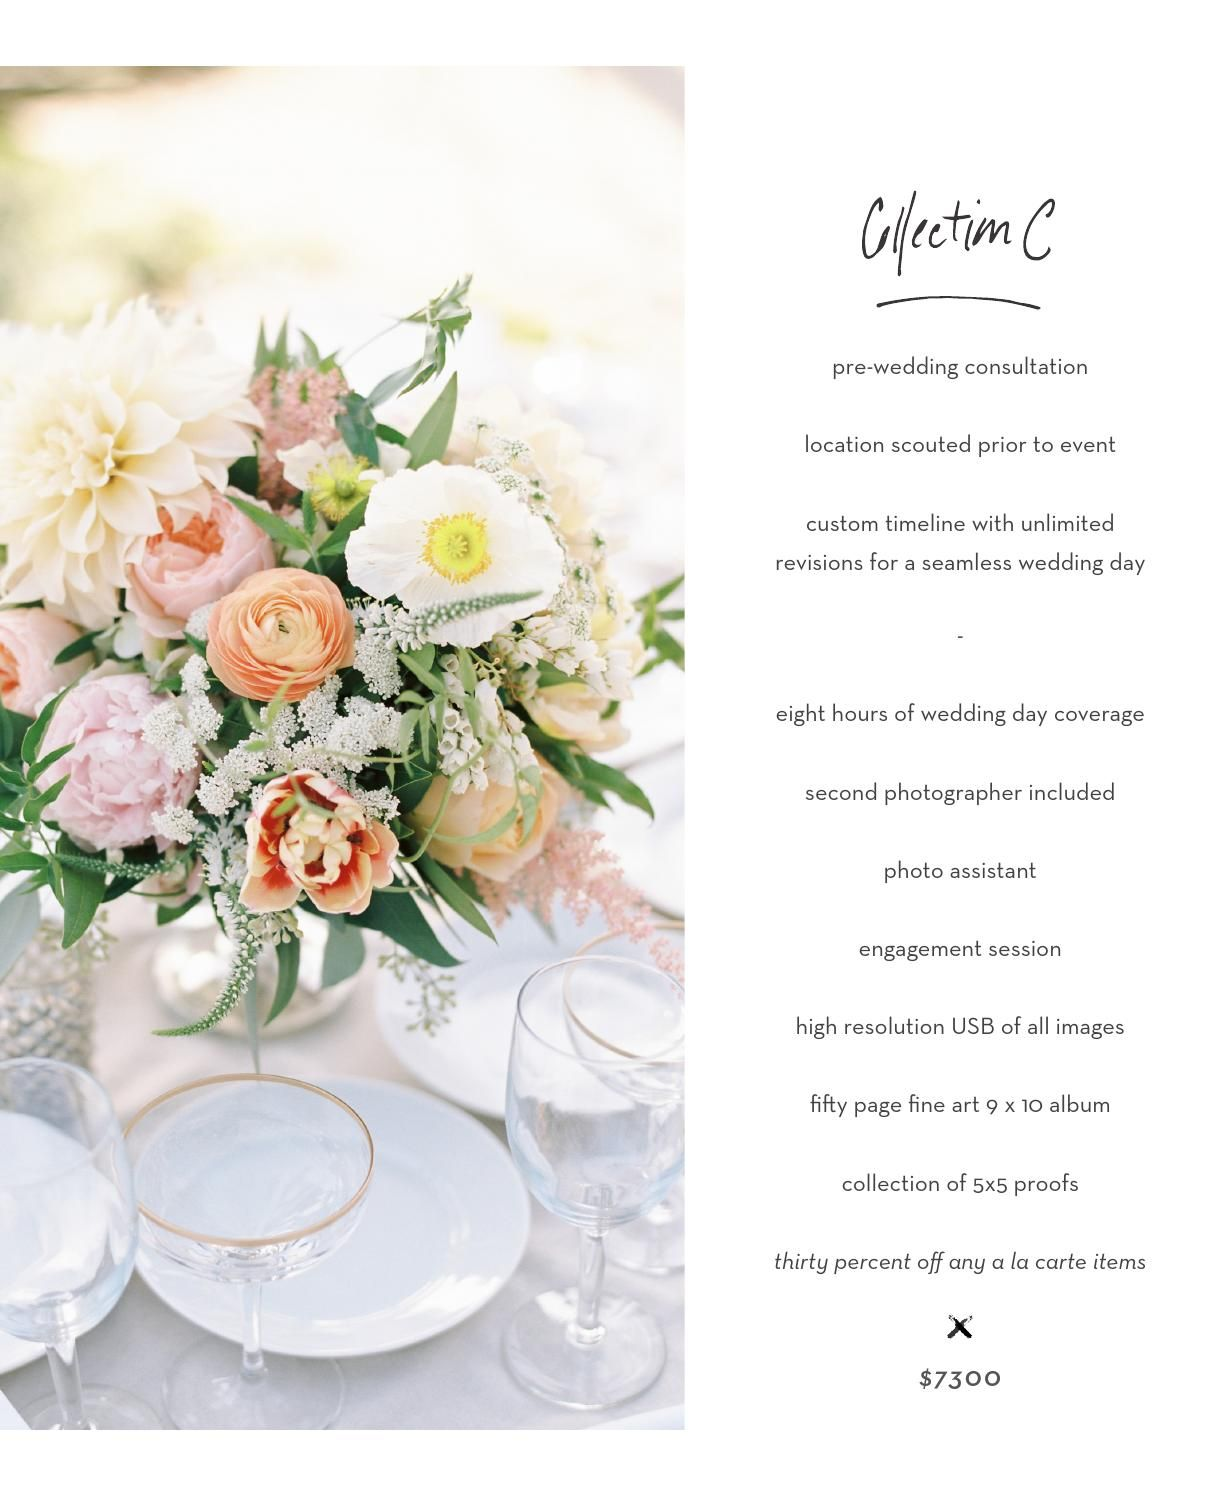 Ashley Kelemen 2015 Wedding Pricing | Weddings